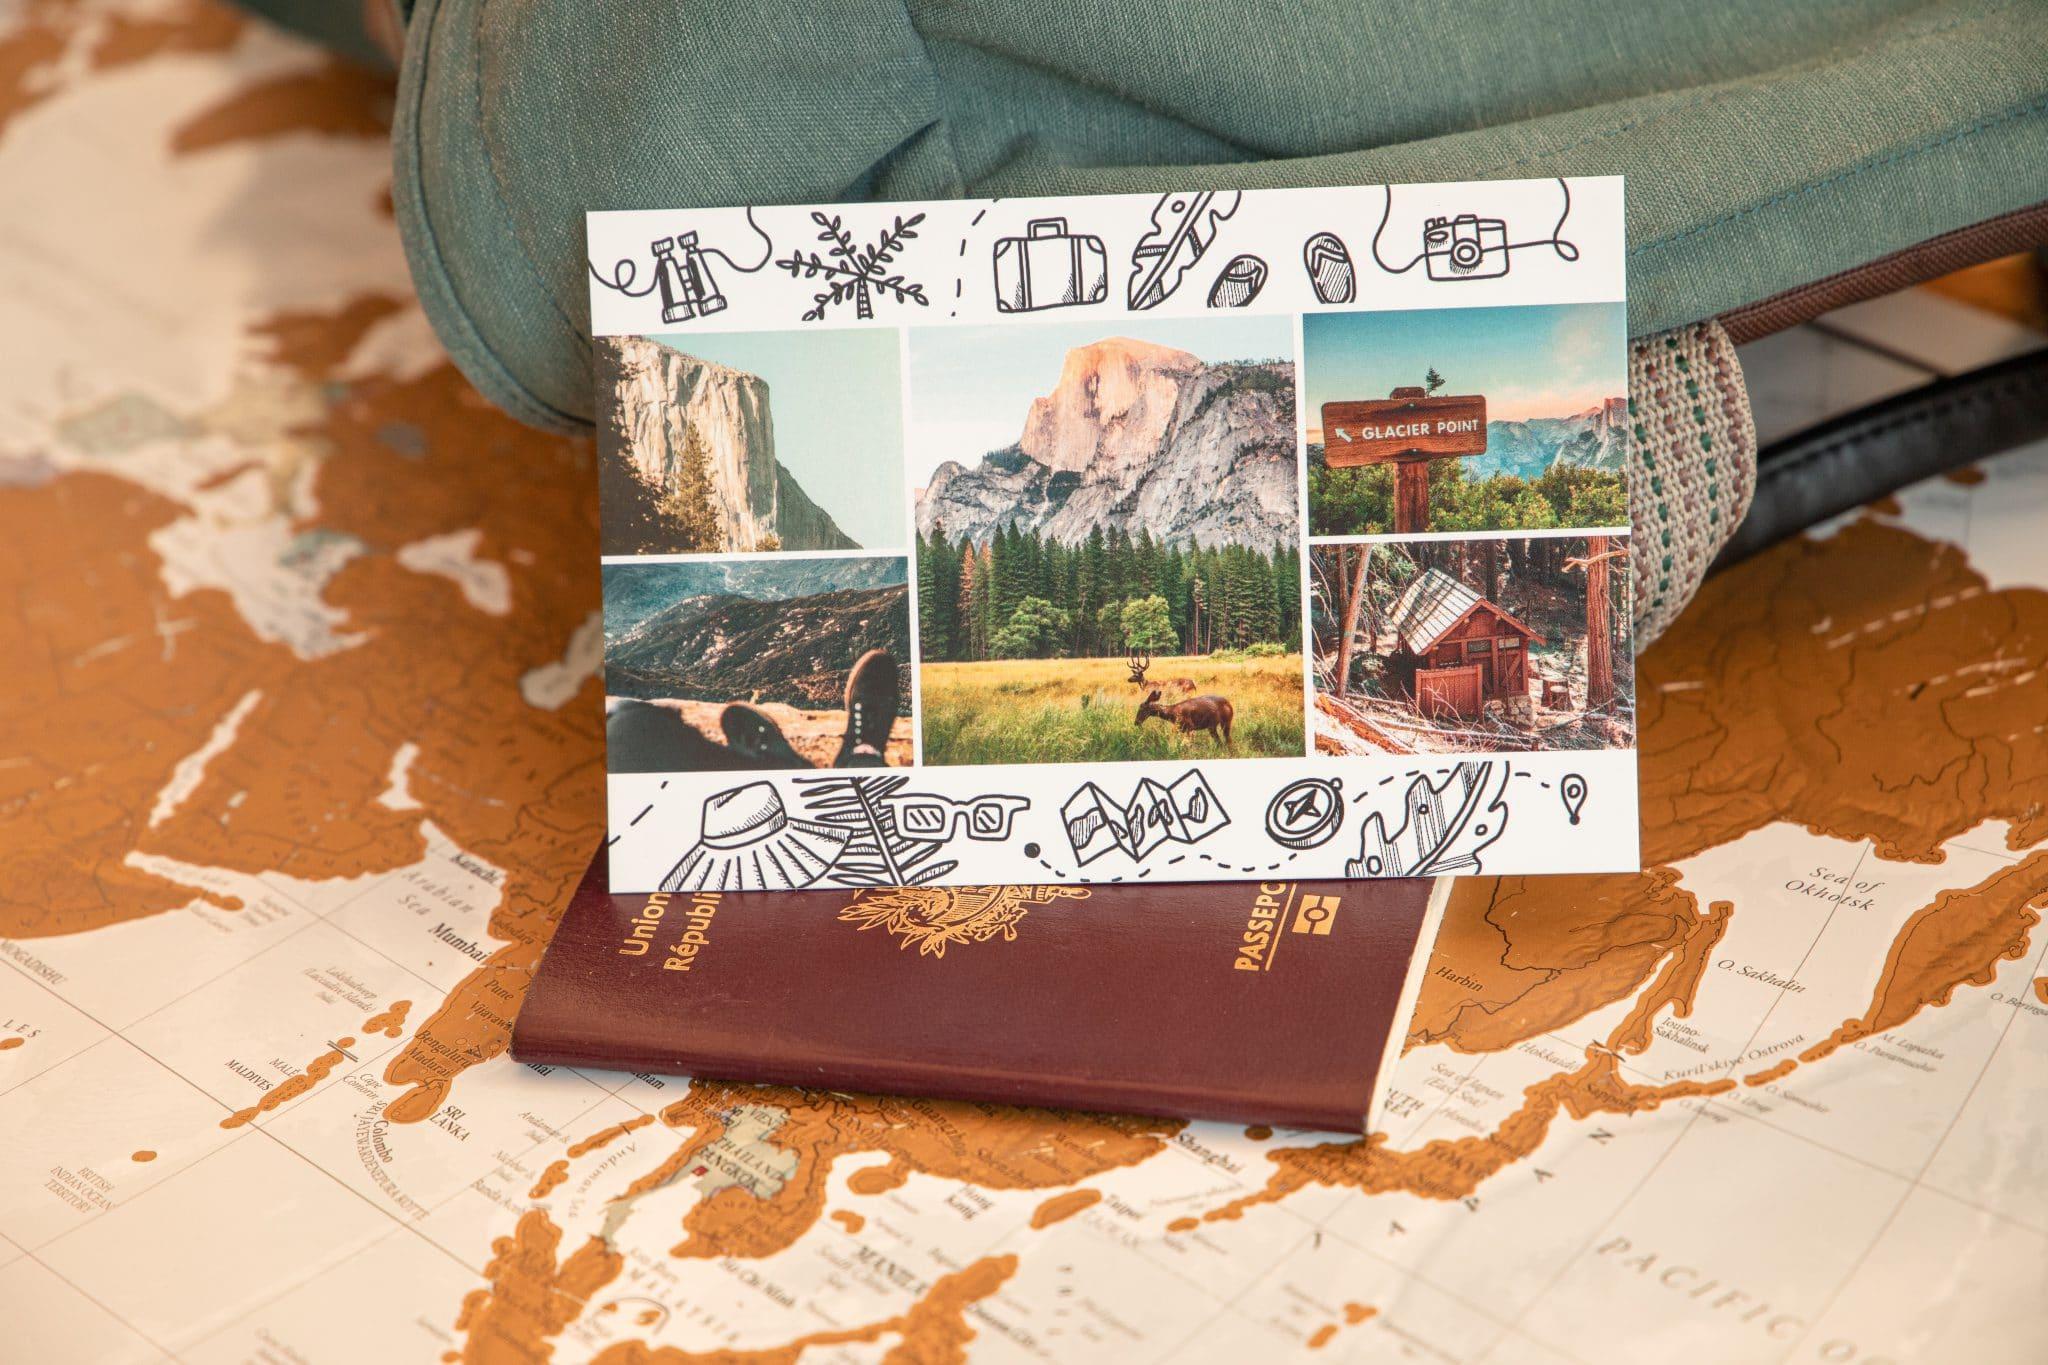 carte postale globe trotter avec sac a dos et passeport